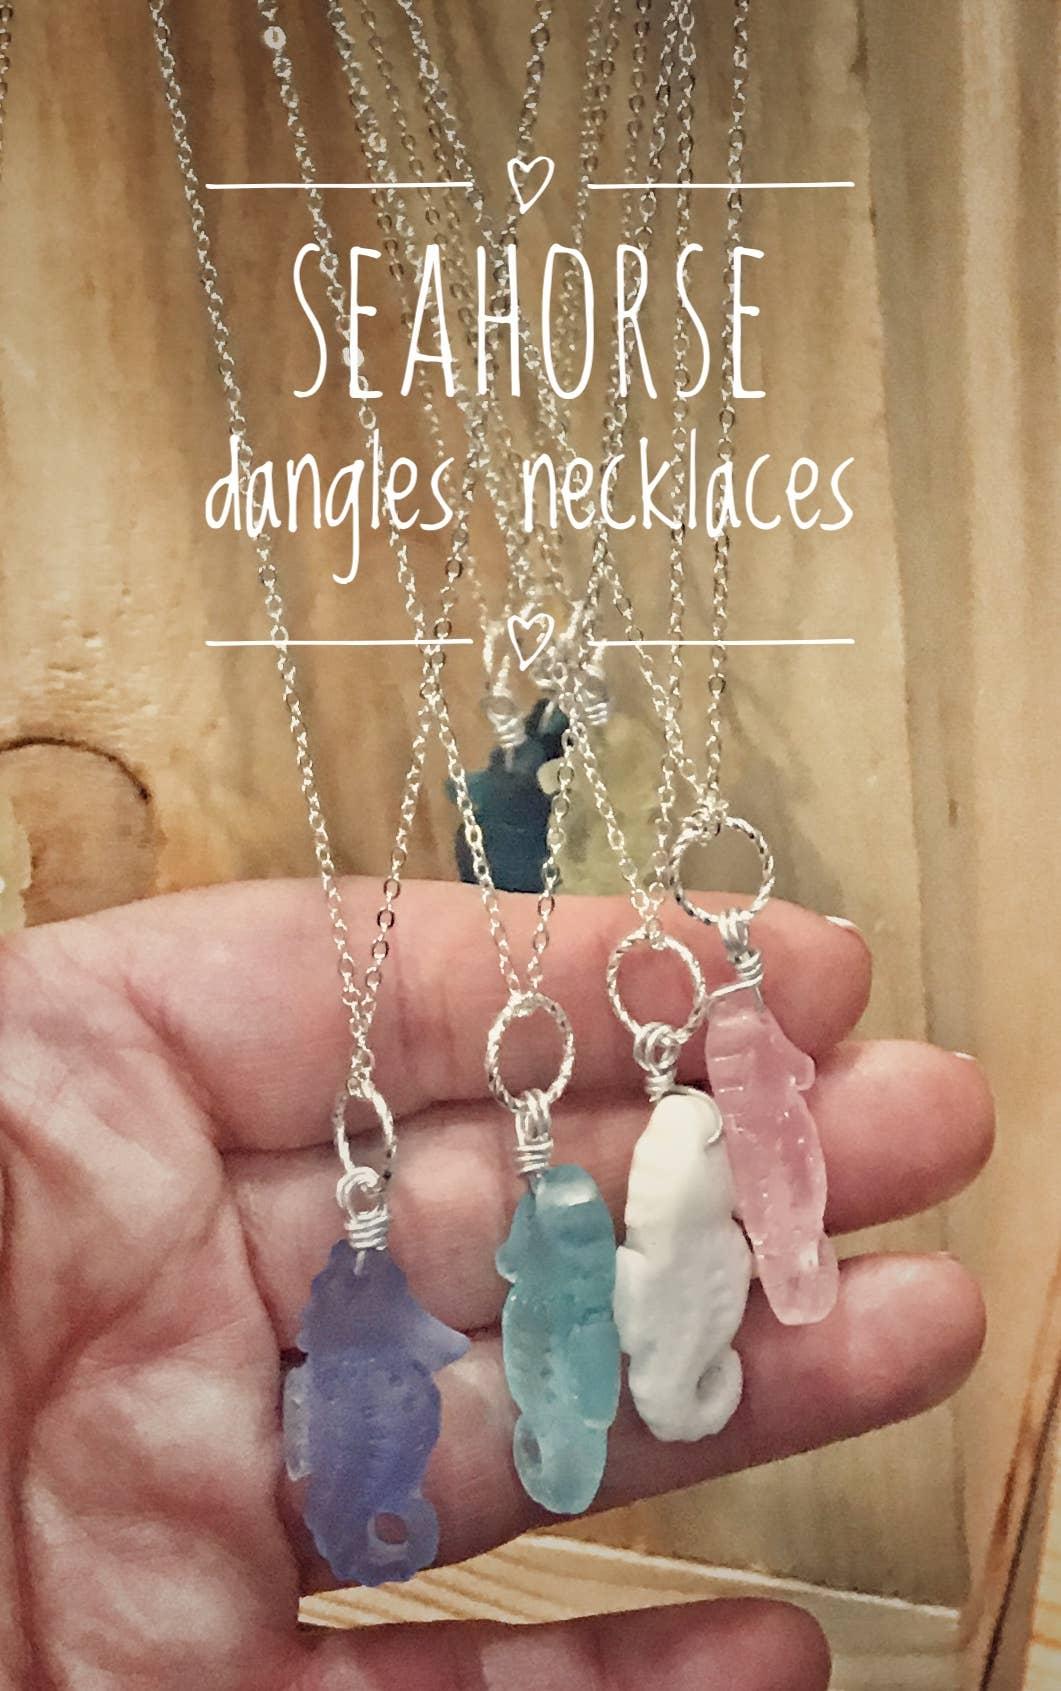 Seahorse Sea glass necklaces dozen | Trada Marketplace